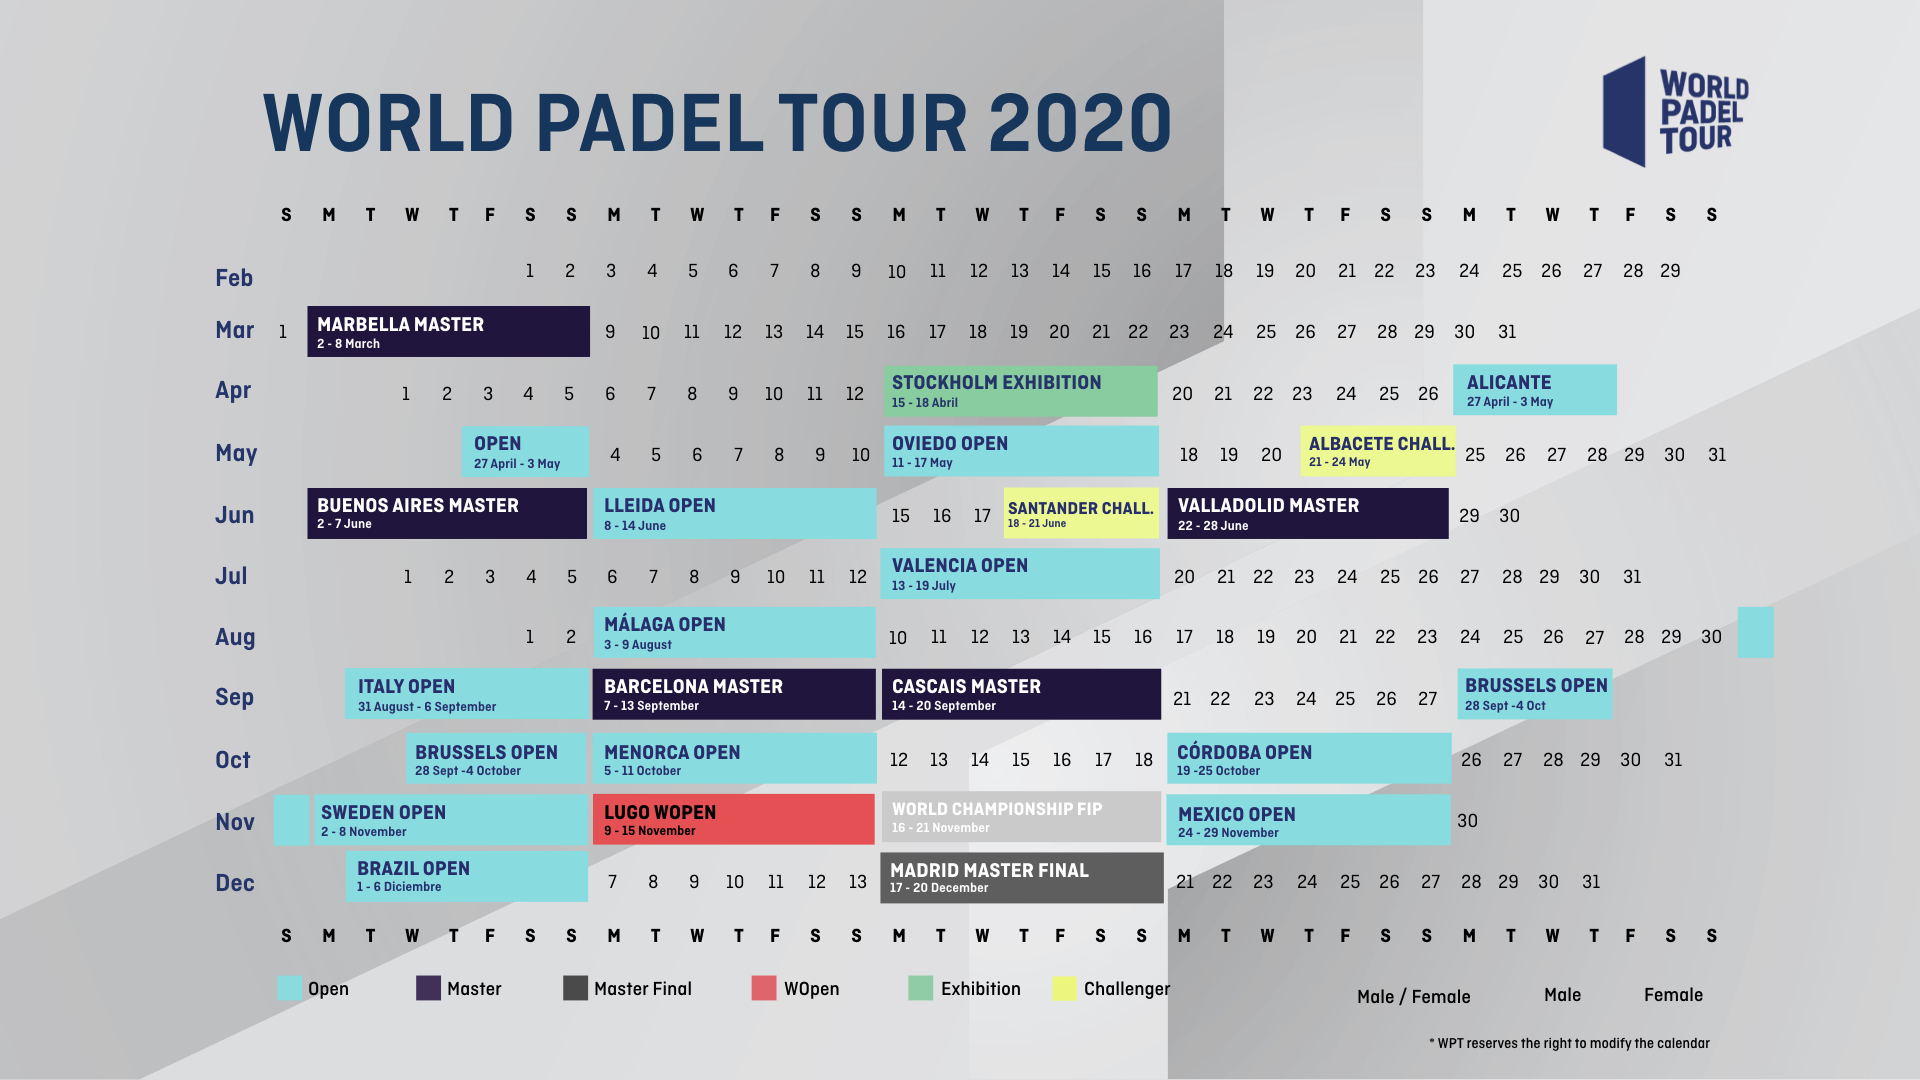 World Padel Tour 2020